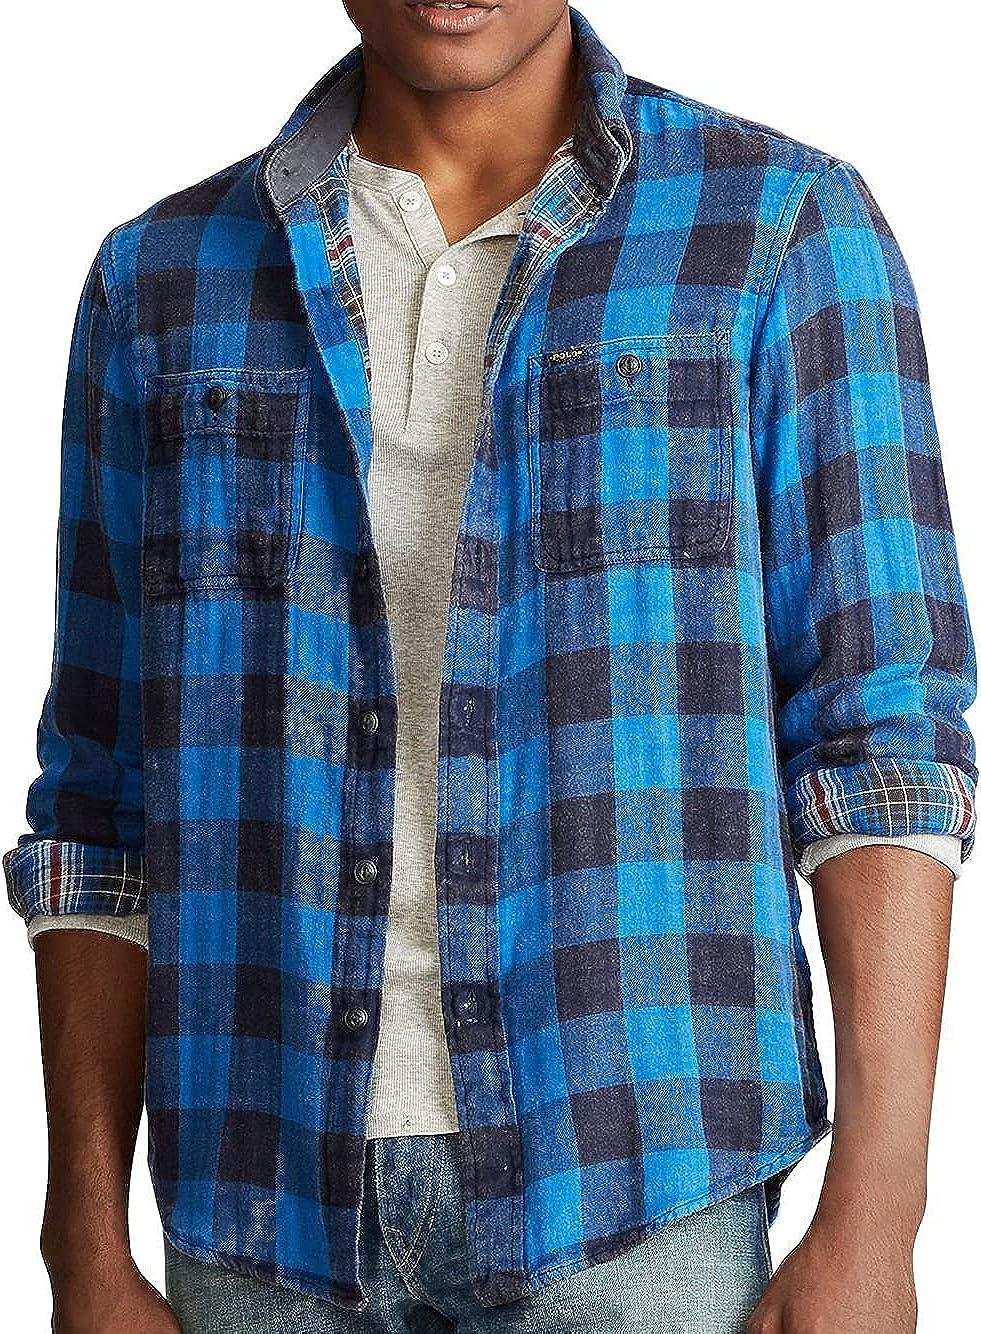 Polo Country Ralph Lauren Mens Blue Sportsman Plaid Western Shirt